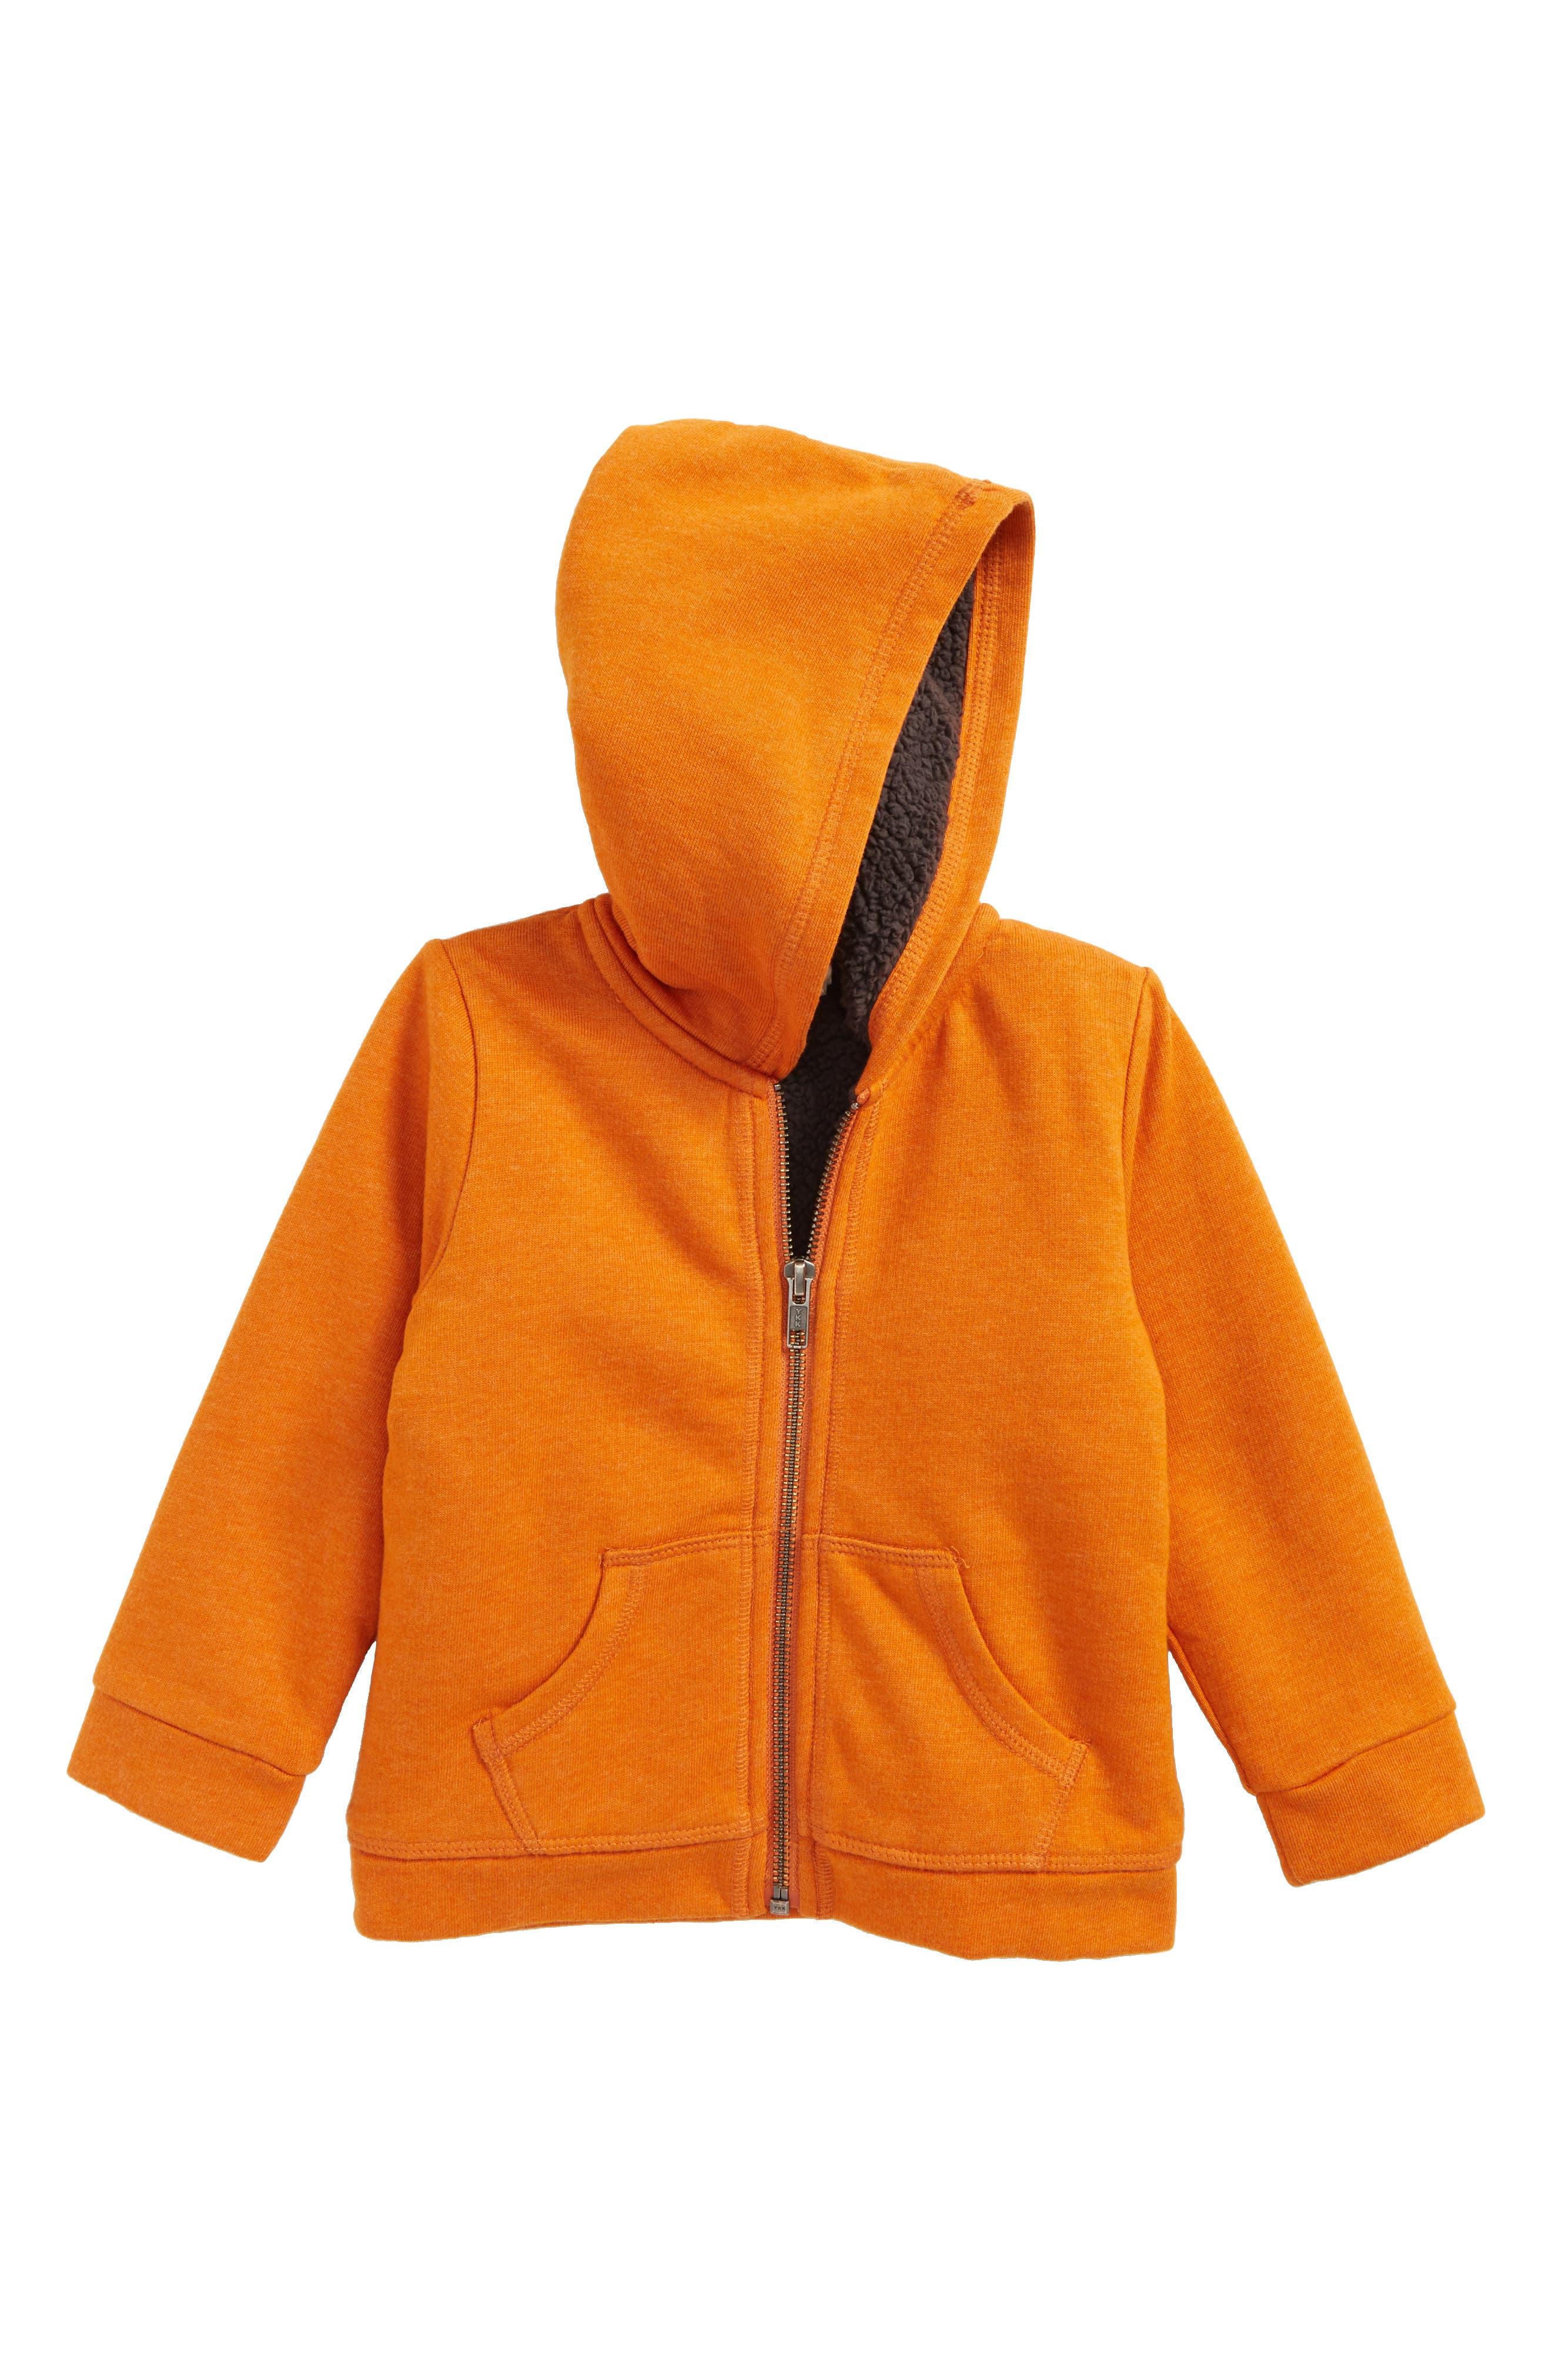 Fleece Lined Hoodie,                             Main thumbnail 1, color,                             Orange Hawaii